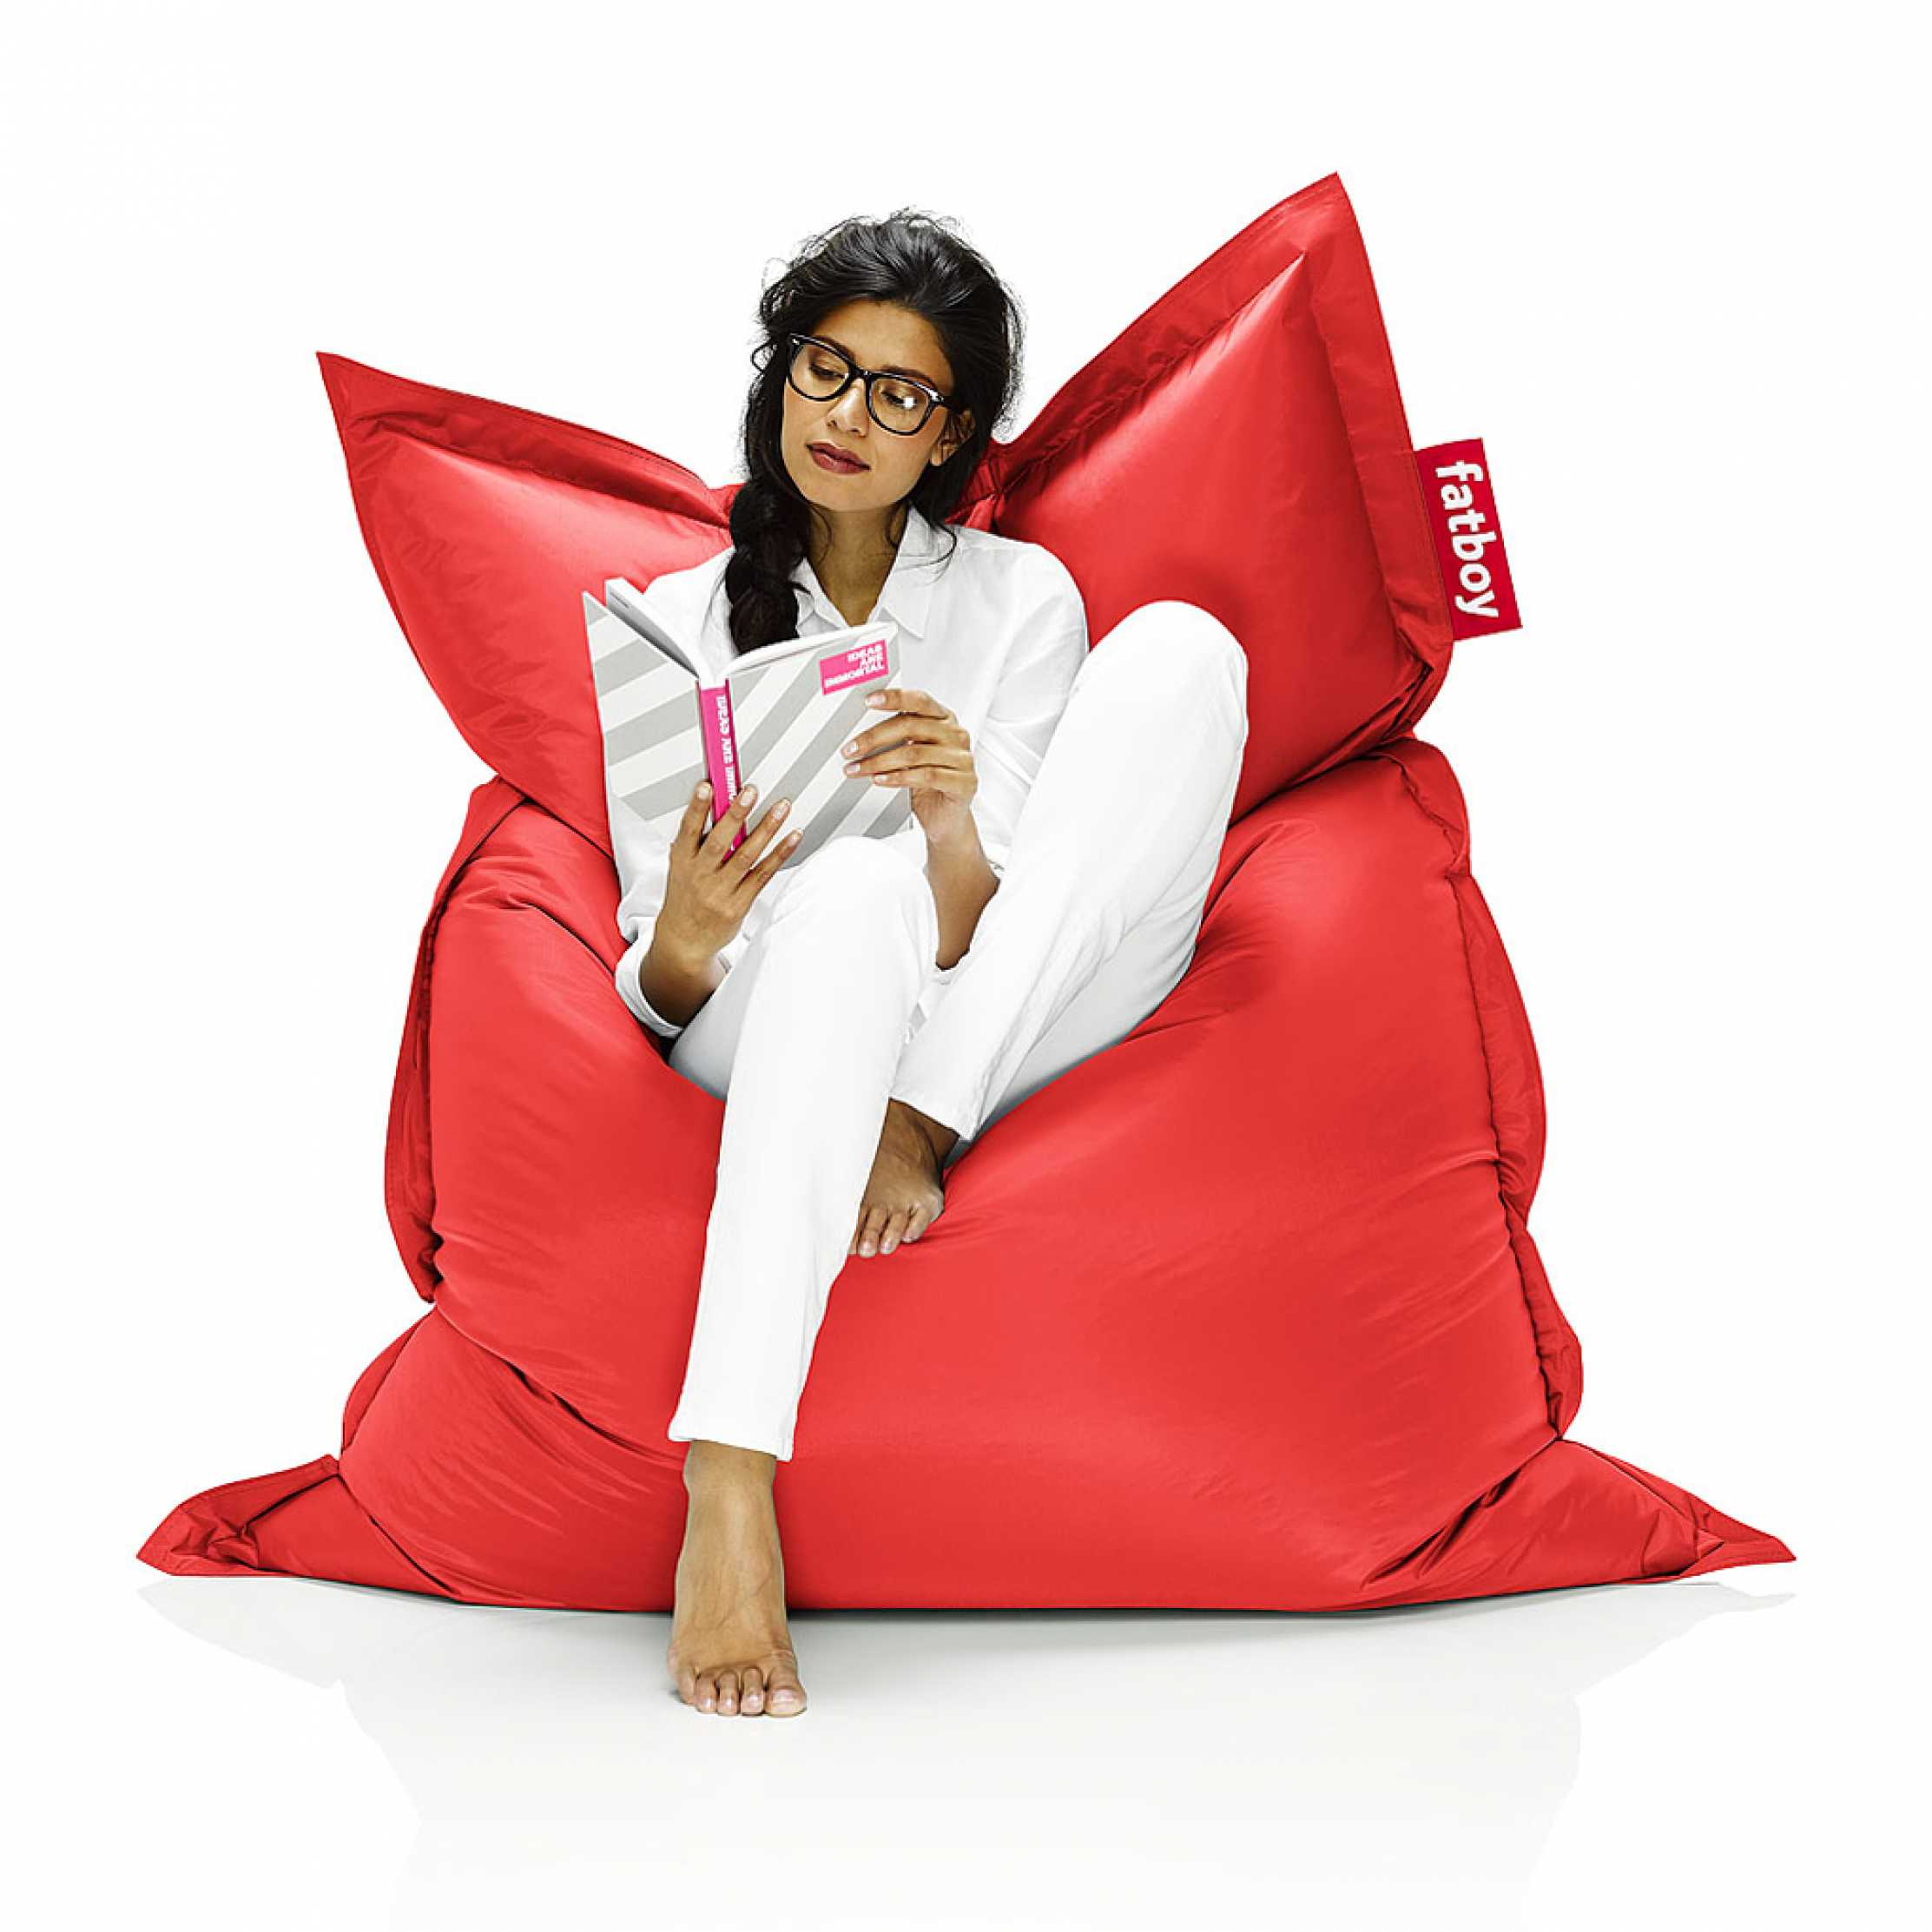 marque fatboy. Black Bedroom Furniture Sets. Home Design Ideas